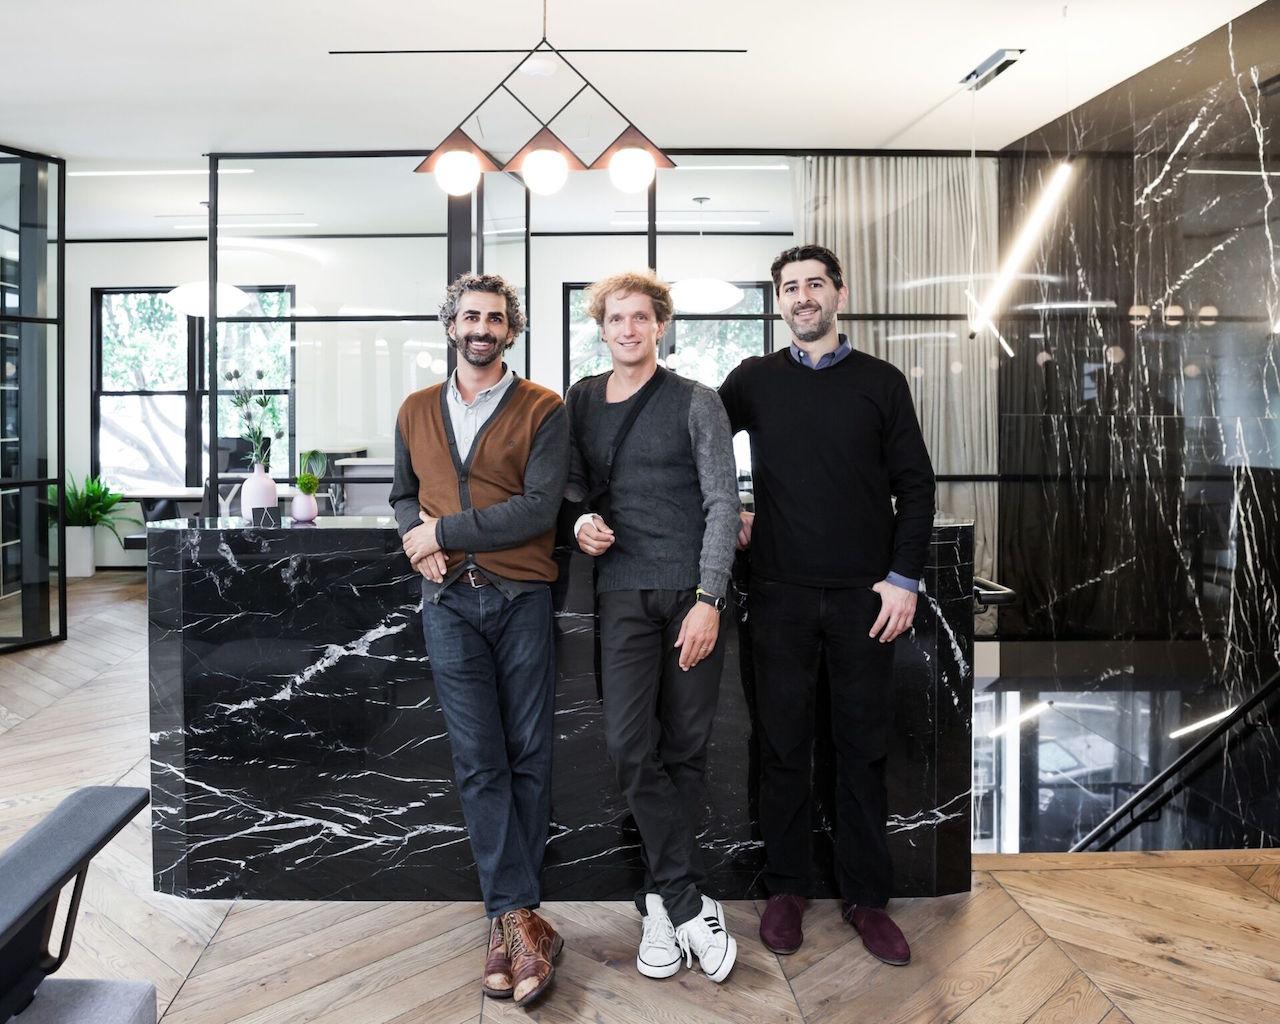 Amir Mortazavi, Yves Behar, Steve Mohebi